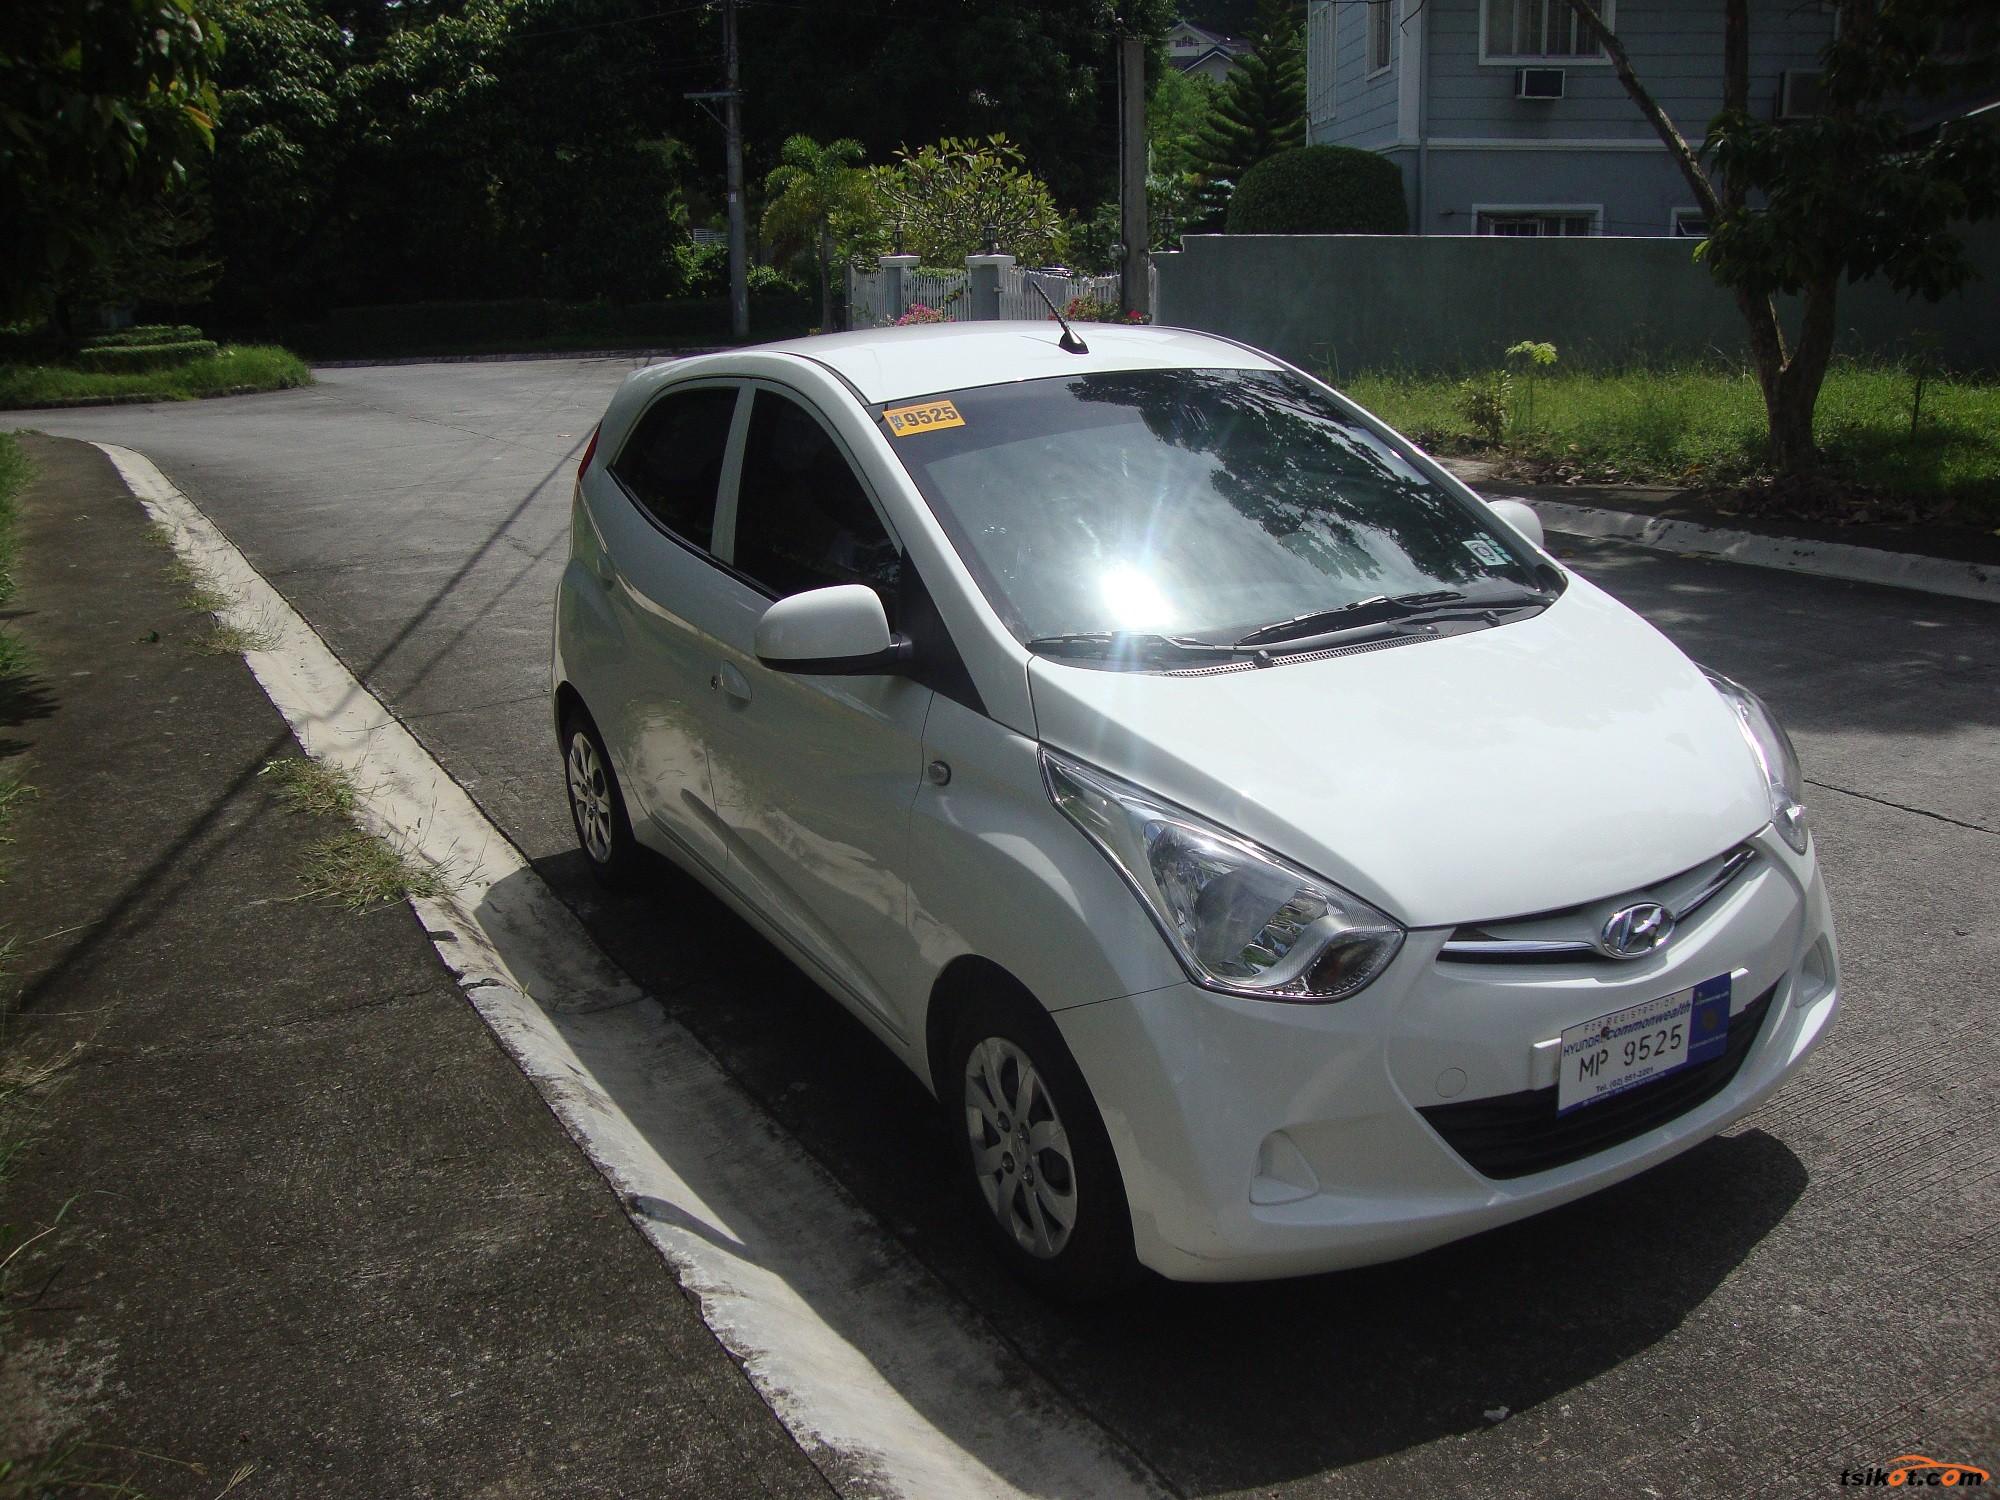 Eon car insurance